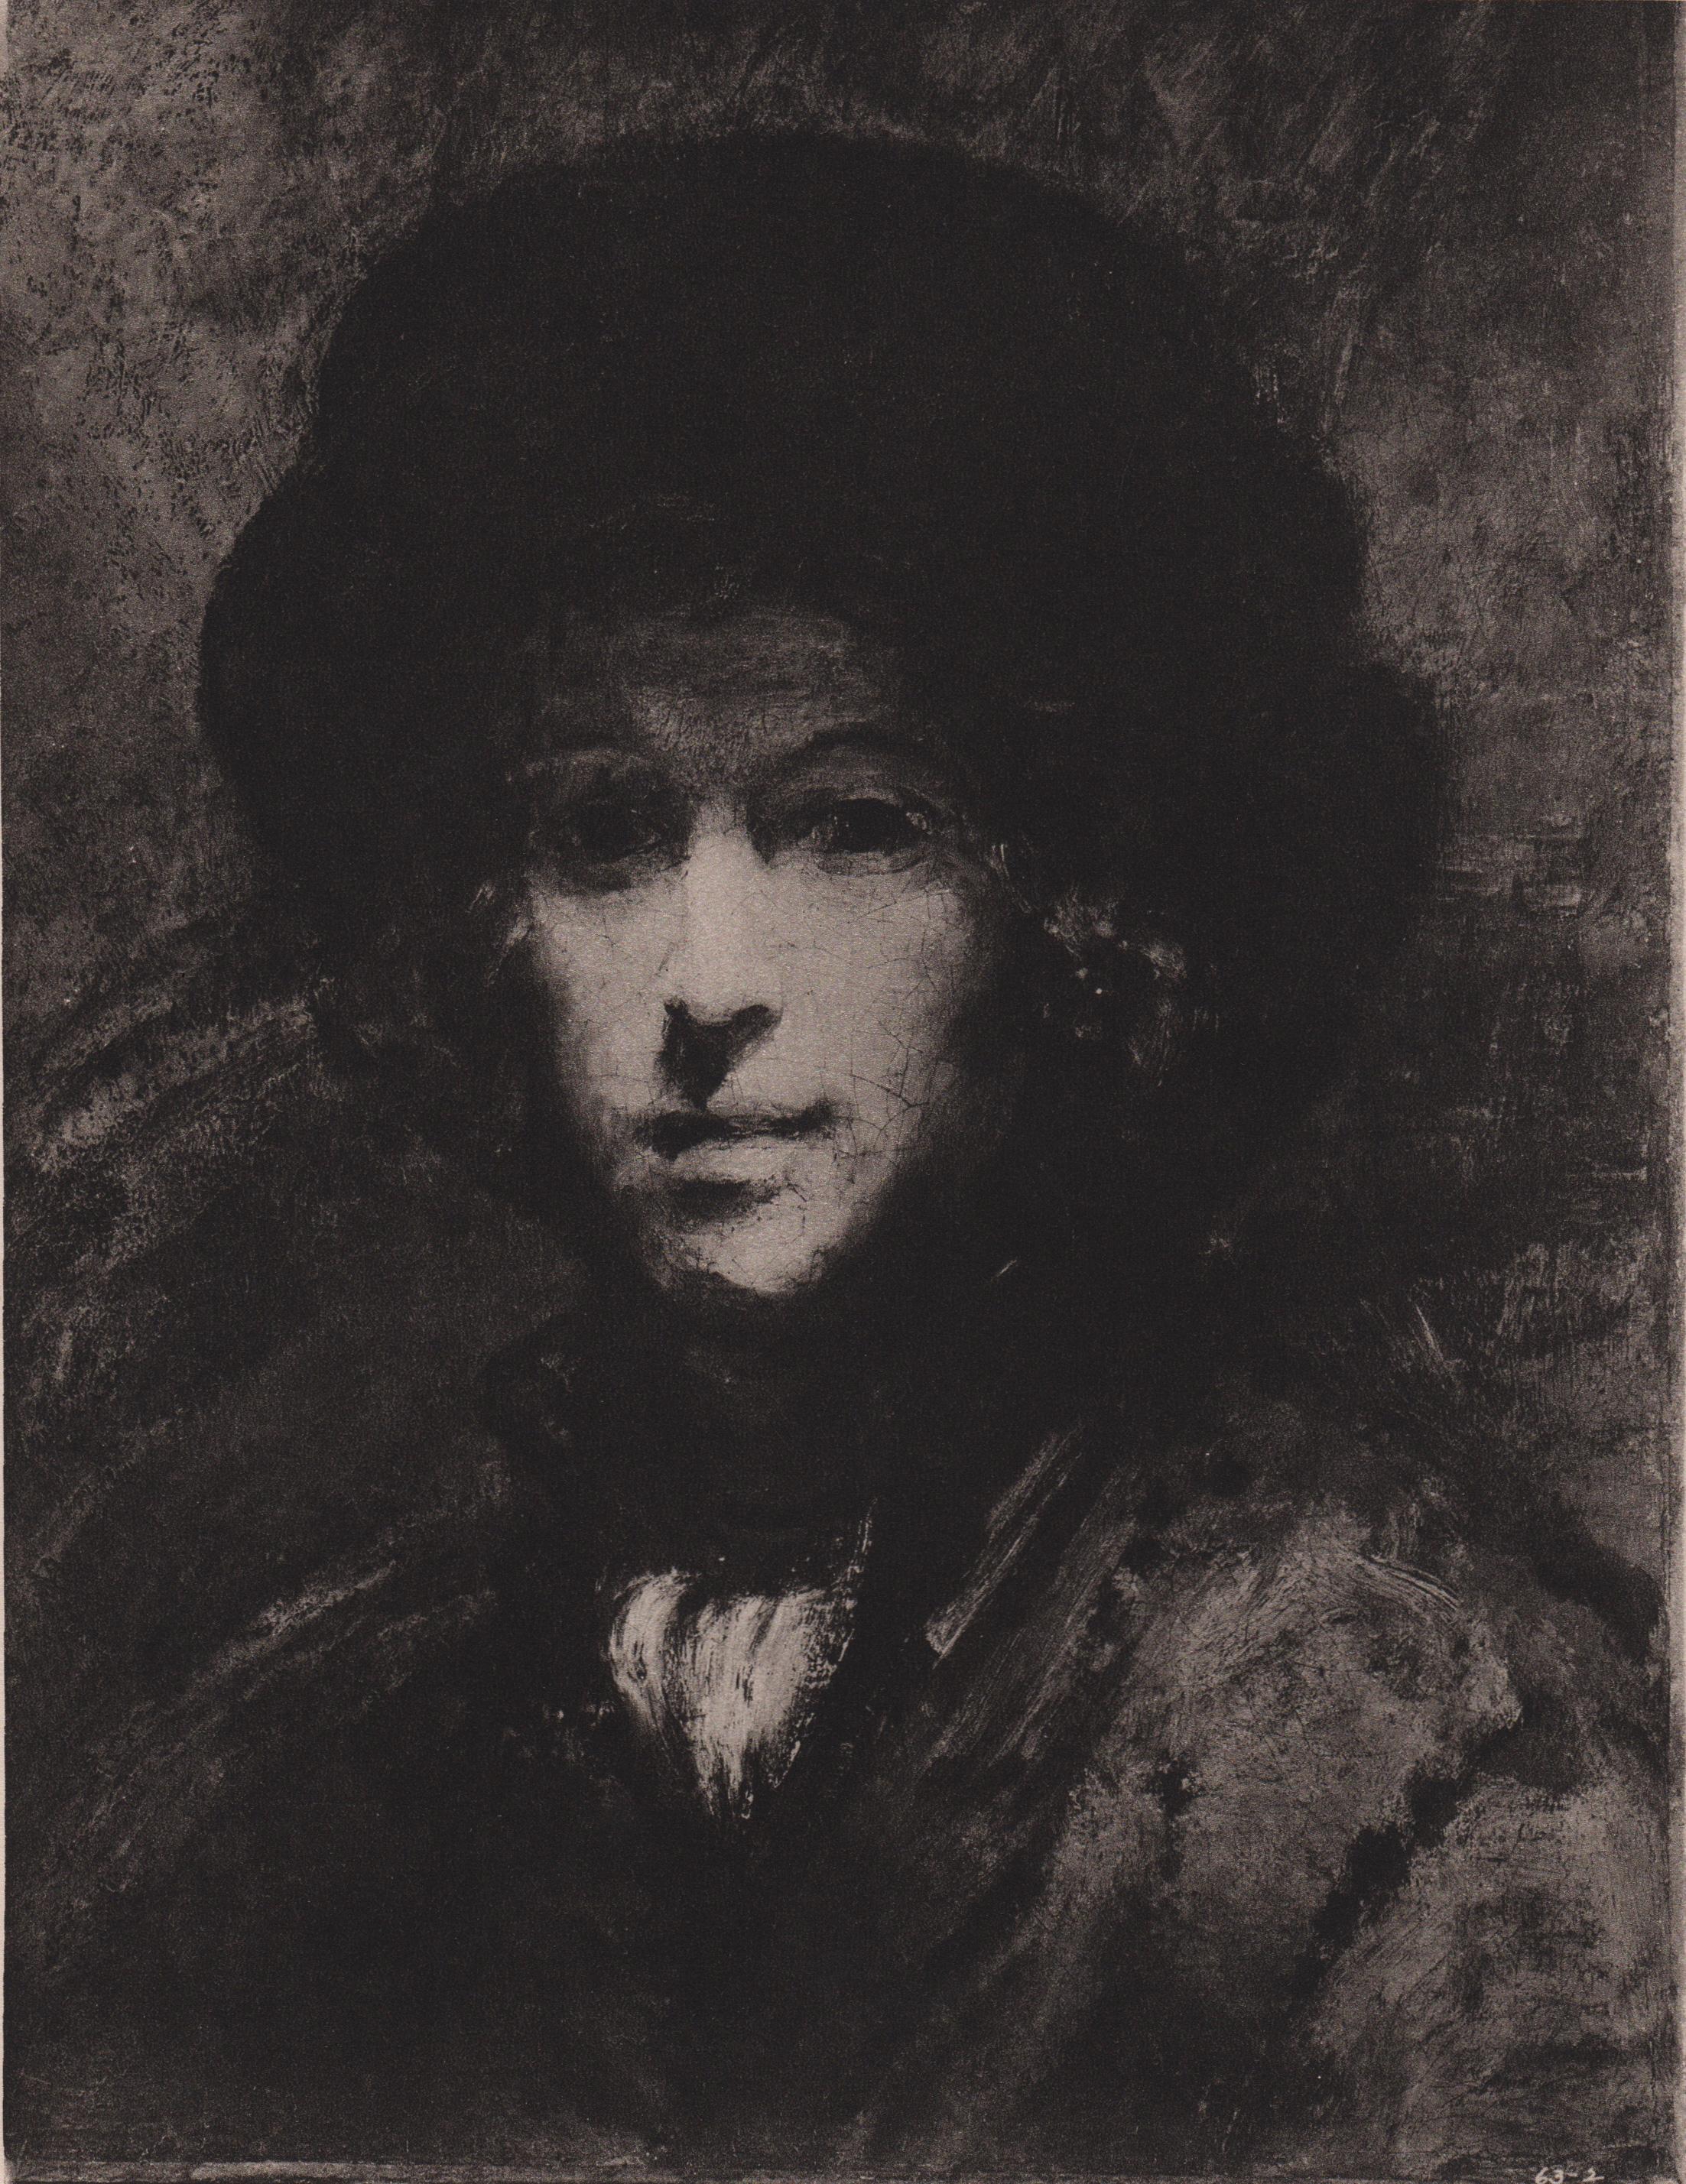 Rembrandt prints (unidentified source, circa 1890-1900)